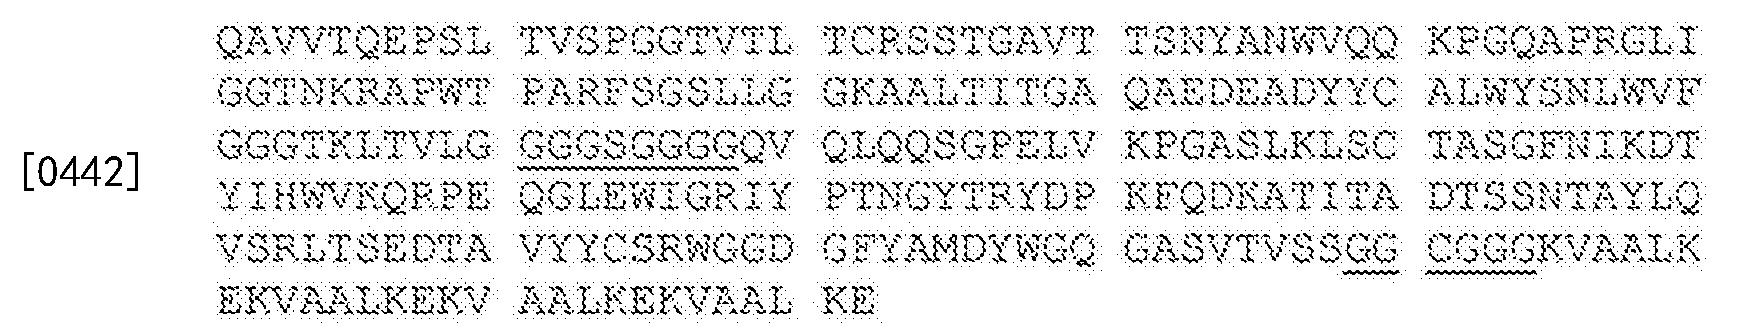 Figure CN107827985AD00592